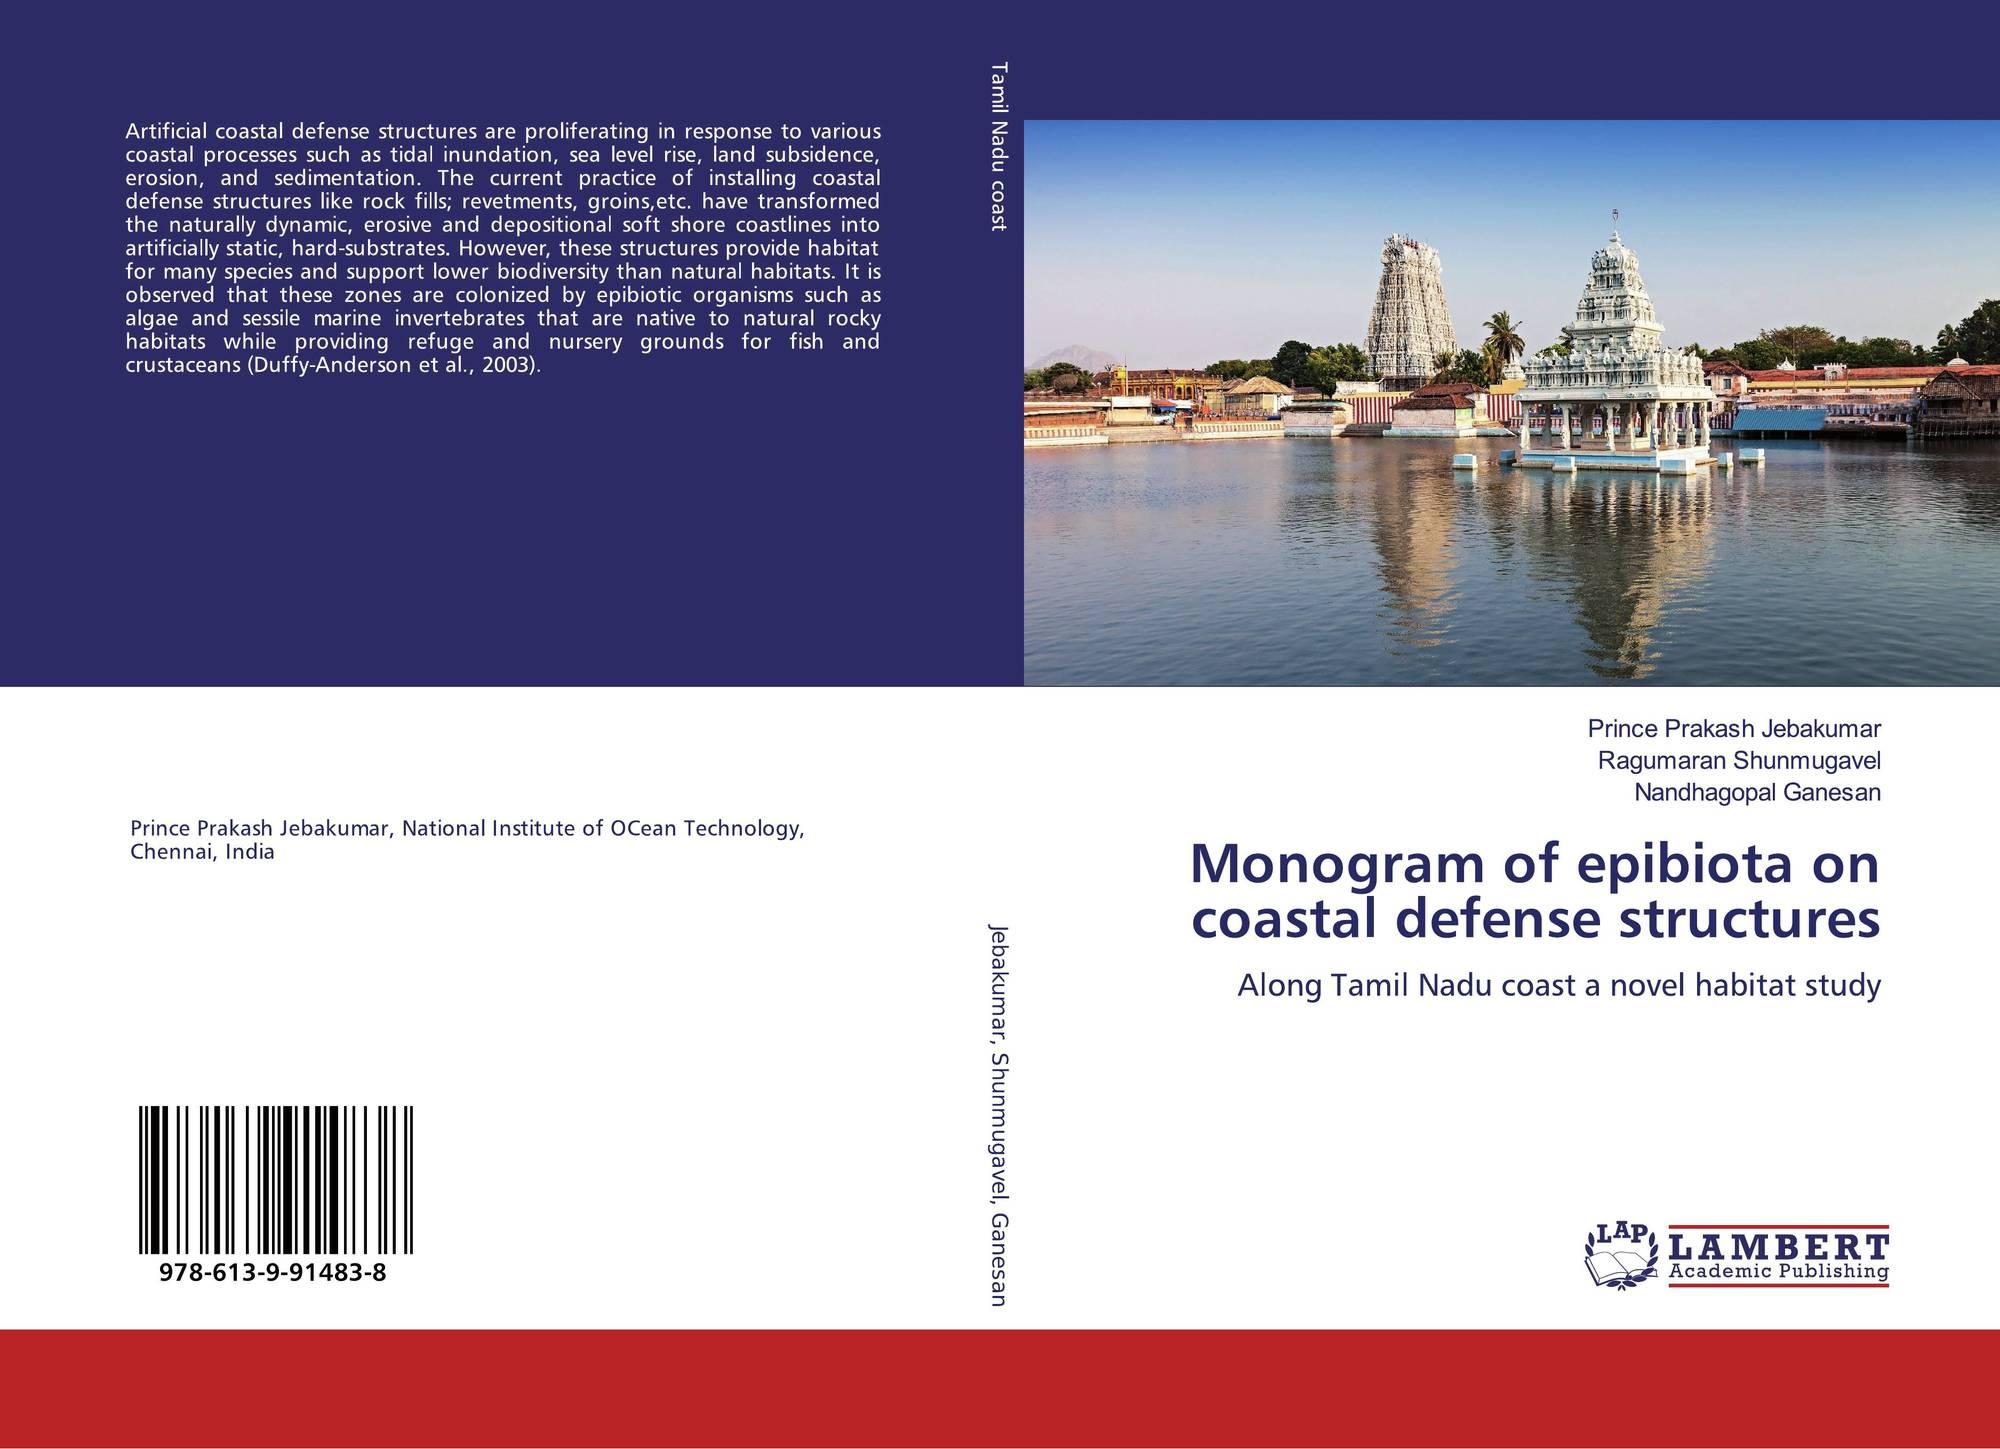 Monogram Of Epibiota On Coastal Defense Structures 978 613 9 91483 8 6139914833 9786139914838 By Prince Prakash Jebakumar Ragumaran Shunmugavel Nandhagopal Ganesan